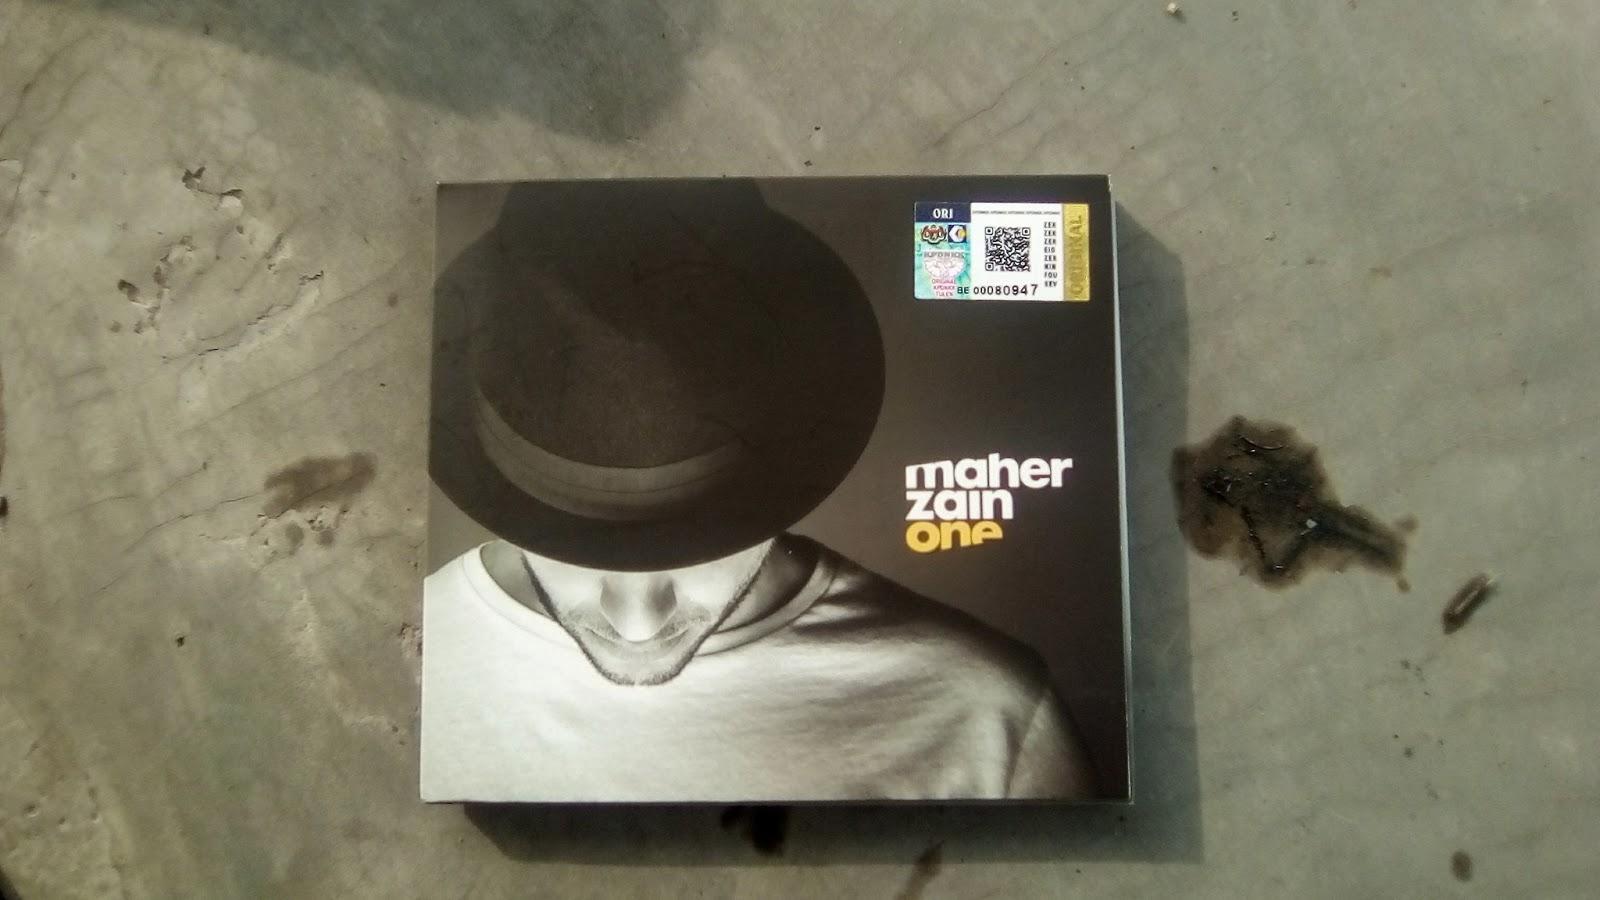 Maher Zain - One Album (CD Rip) | [Download MP3]